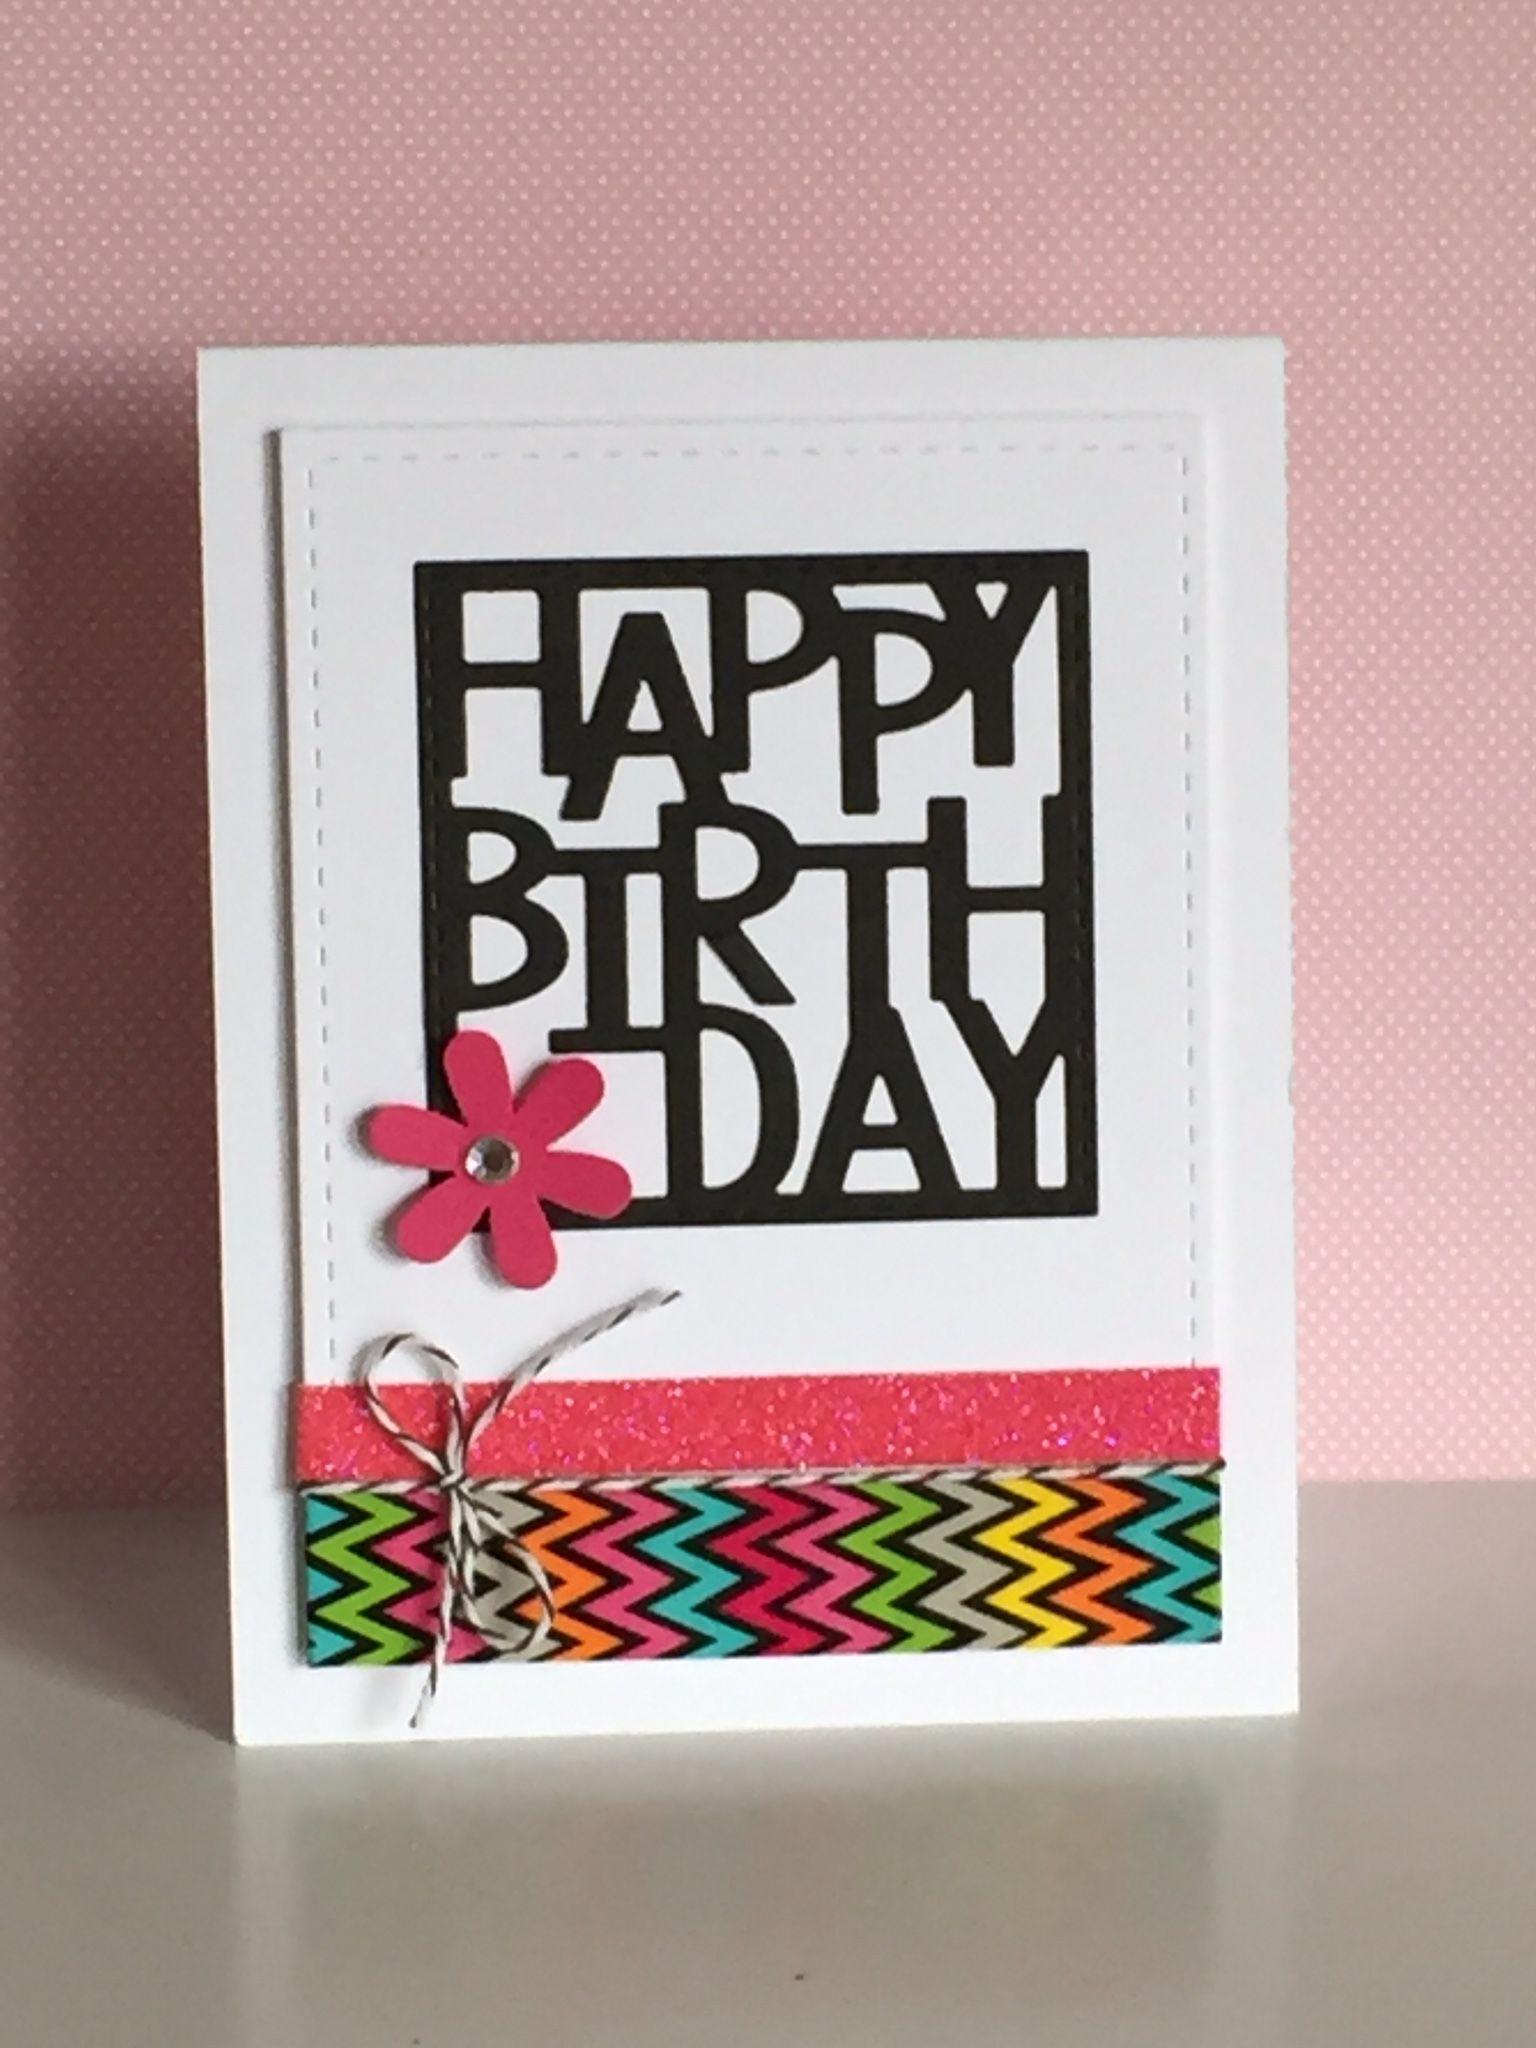 Happy Birthday Is Die From Lil Inker Designs Misc Washi Tape Birthday Cards Cool Birthday Cards Unique Birthday Cards